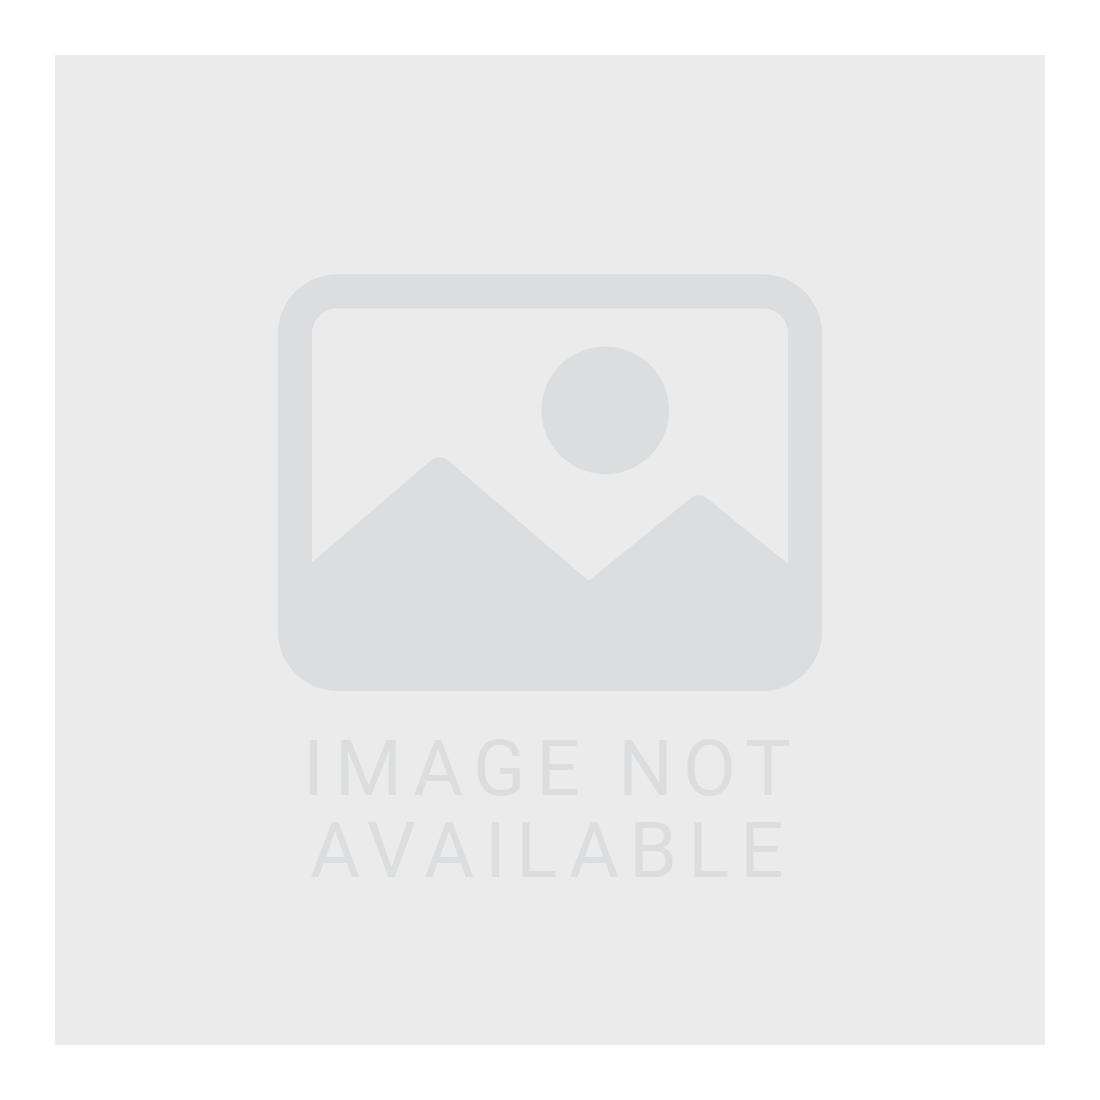 1:64 1969 Dodge Charger Daytona Diecast